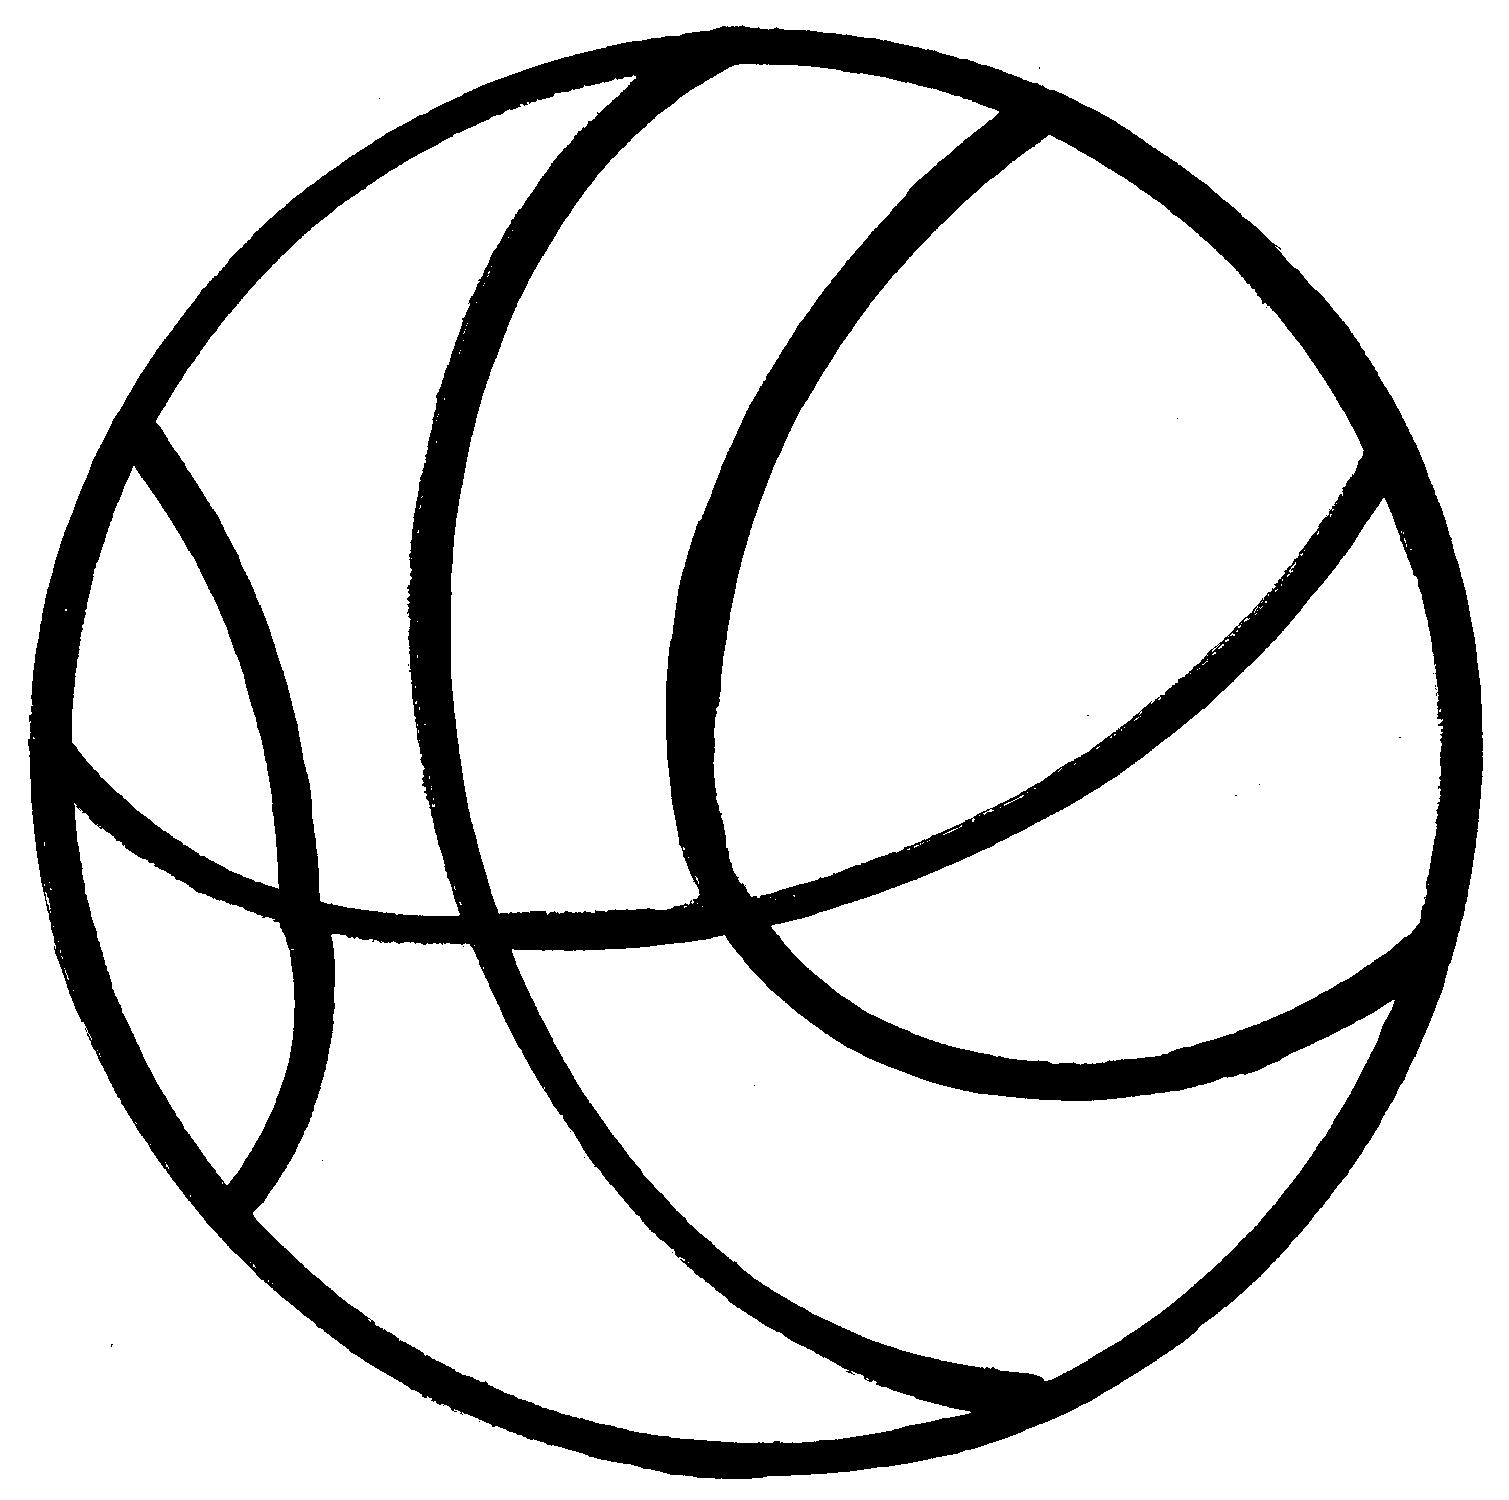 Basketball clip art black vergilis clipart 4